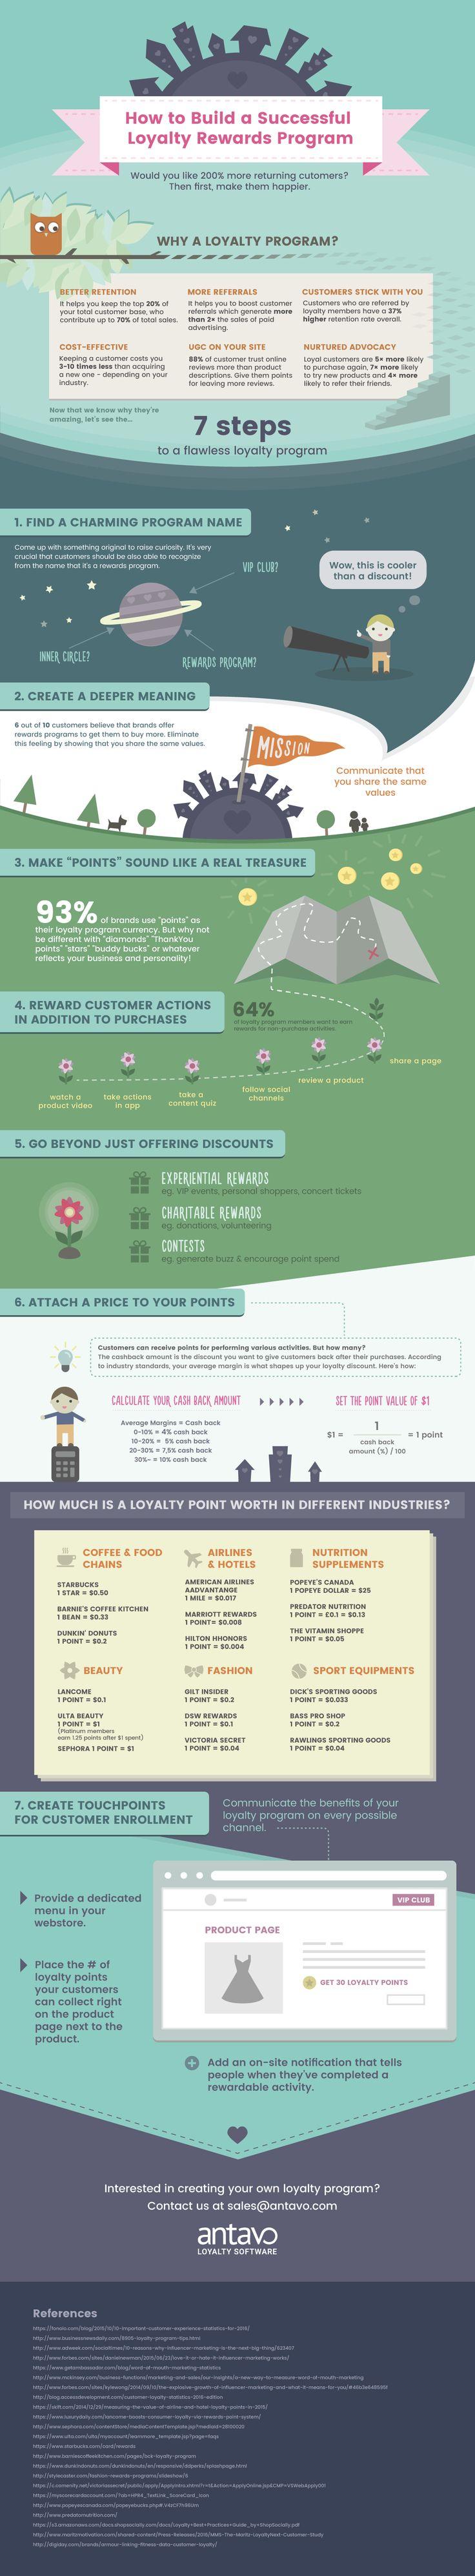 How To Build A Successful Loyalty Rewards Program: http://blog.hubspot.com/marketing/build-customer-loyalty-program